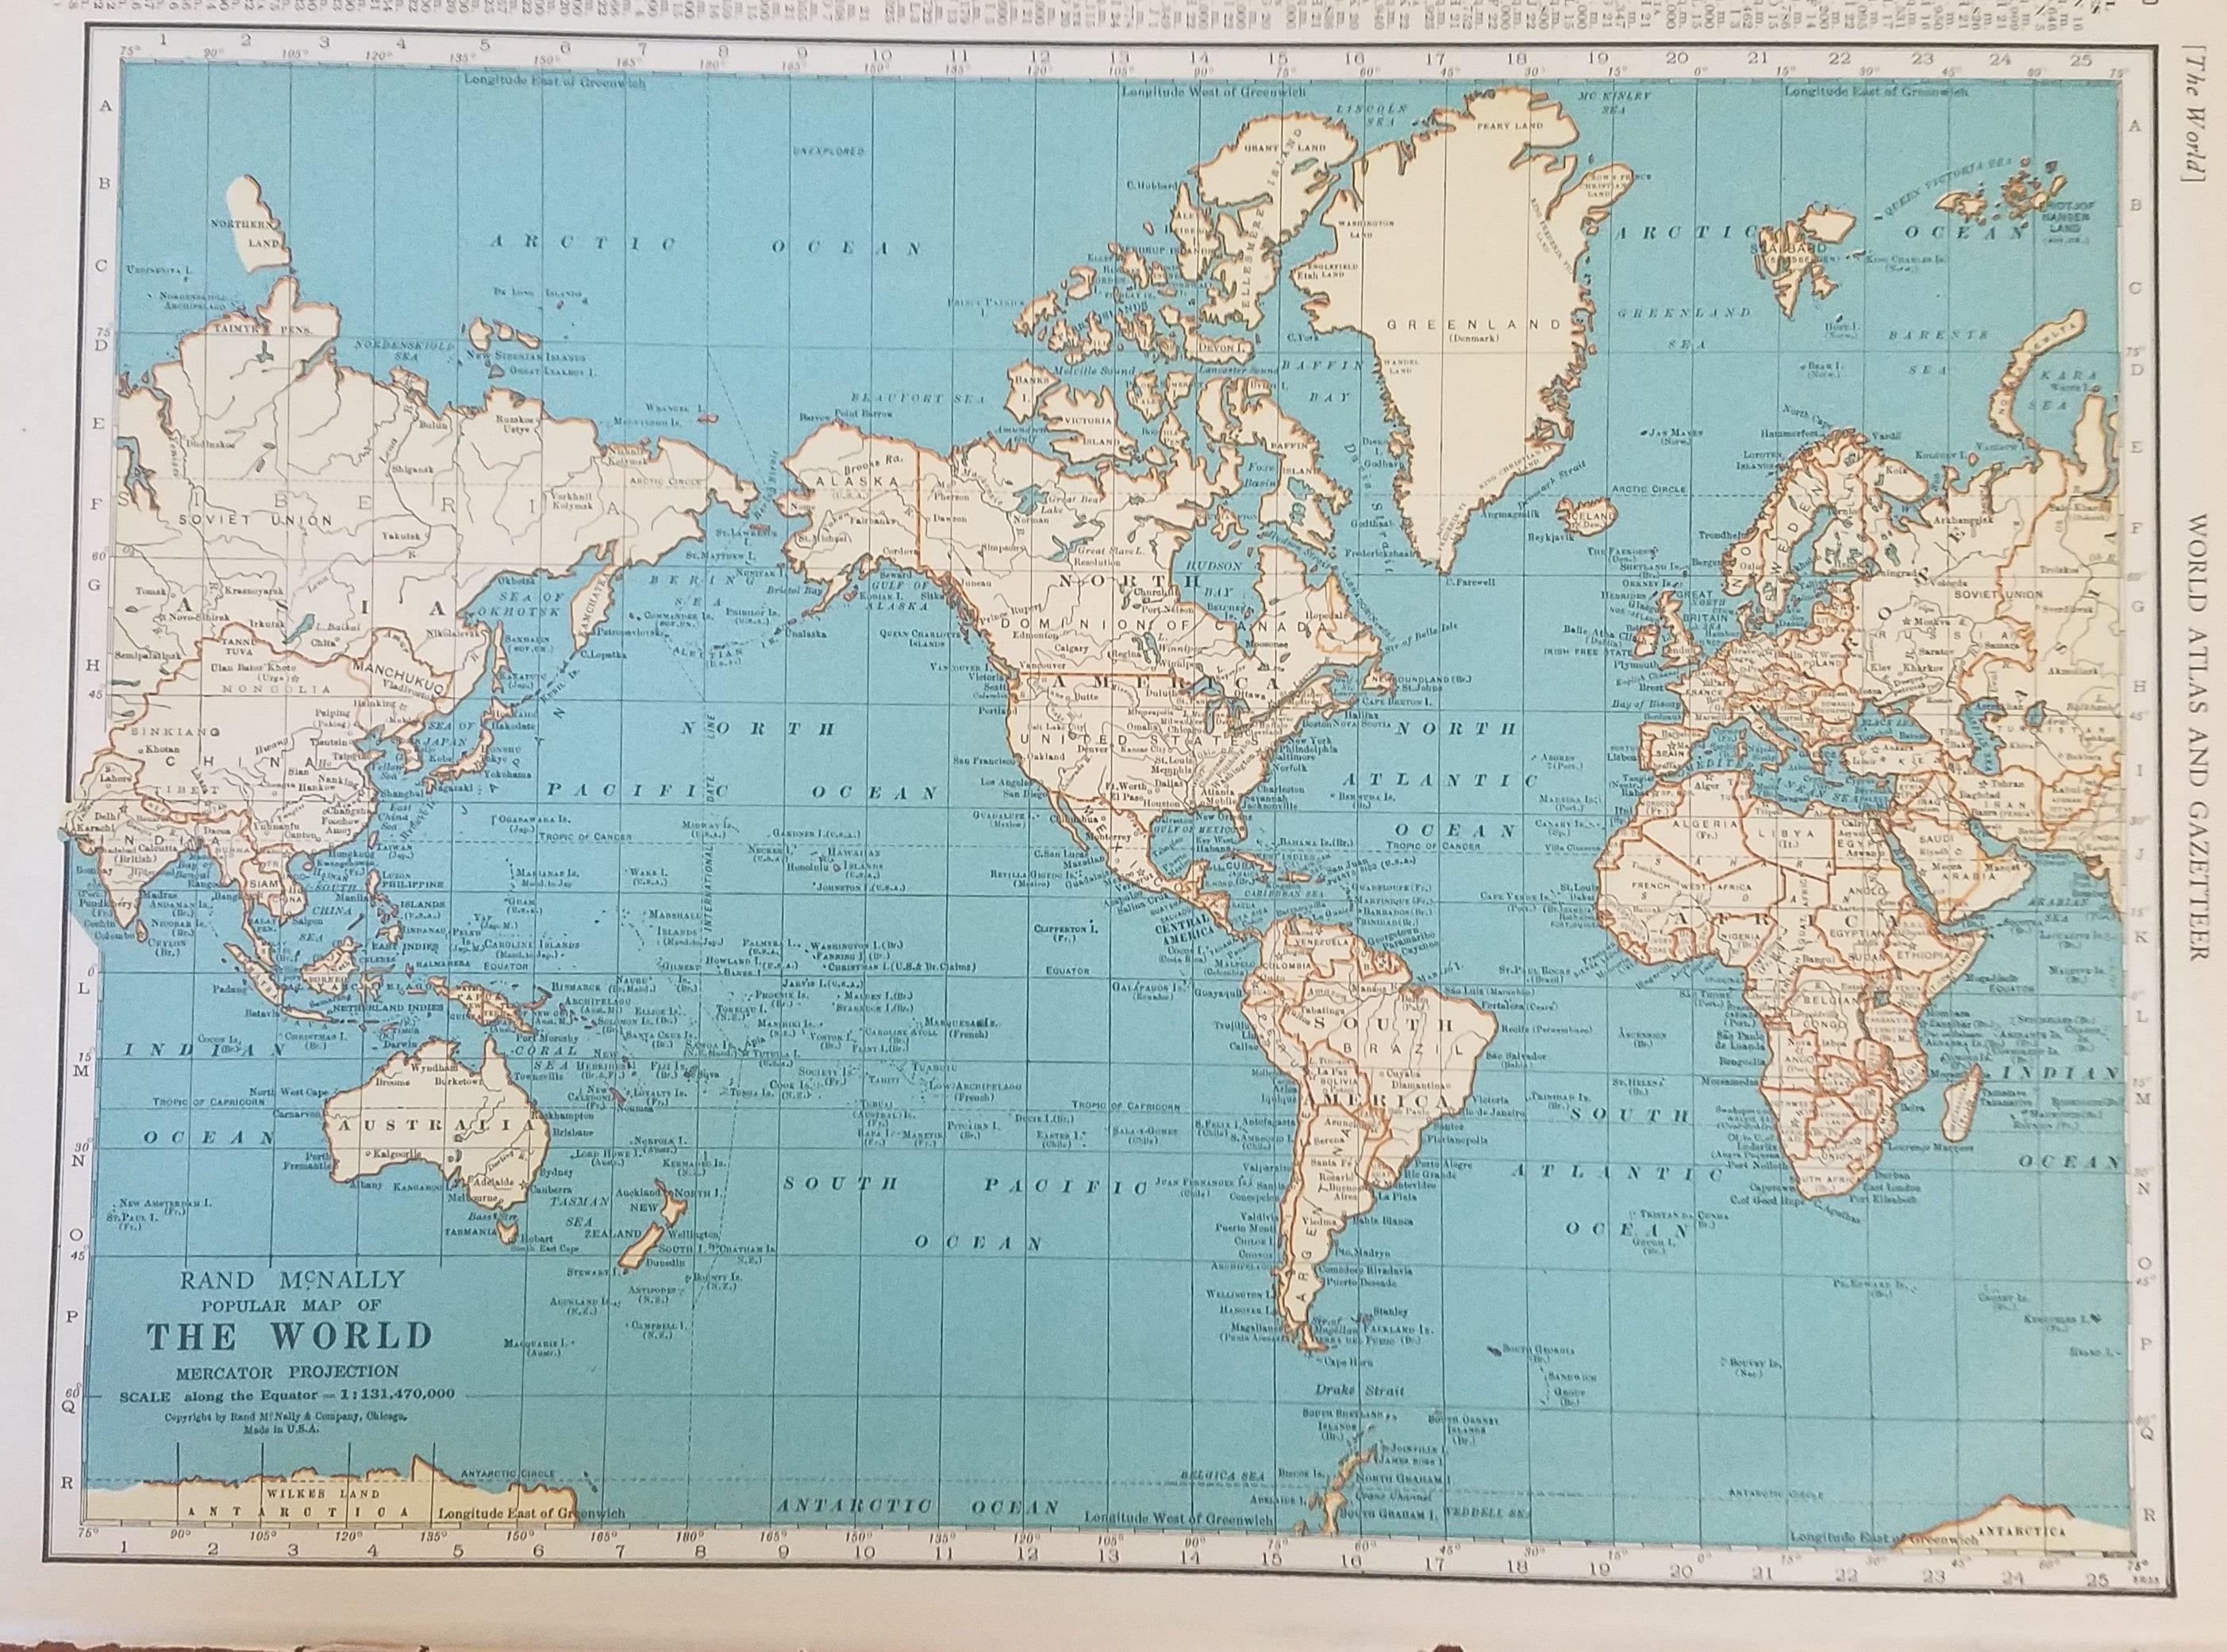 World Map,World Map Art,America USA Asia Africa Oceania Arctic Europe on iceland greenland norway, iceland map globe, iceland map tourist spots, iceland people, iceland waterfalls, iceland culture, iceland animals, iceland towns, iceland map english, iceland world mape, iceland weather, iceland volcano, iceland flag, iceland islands map, iceland and norway map, iceland points of interest maps, iceland world globe, iceland map with main rivers names, iceland on map, iceland map europe,